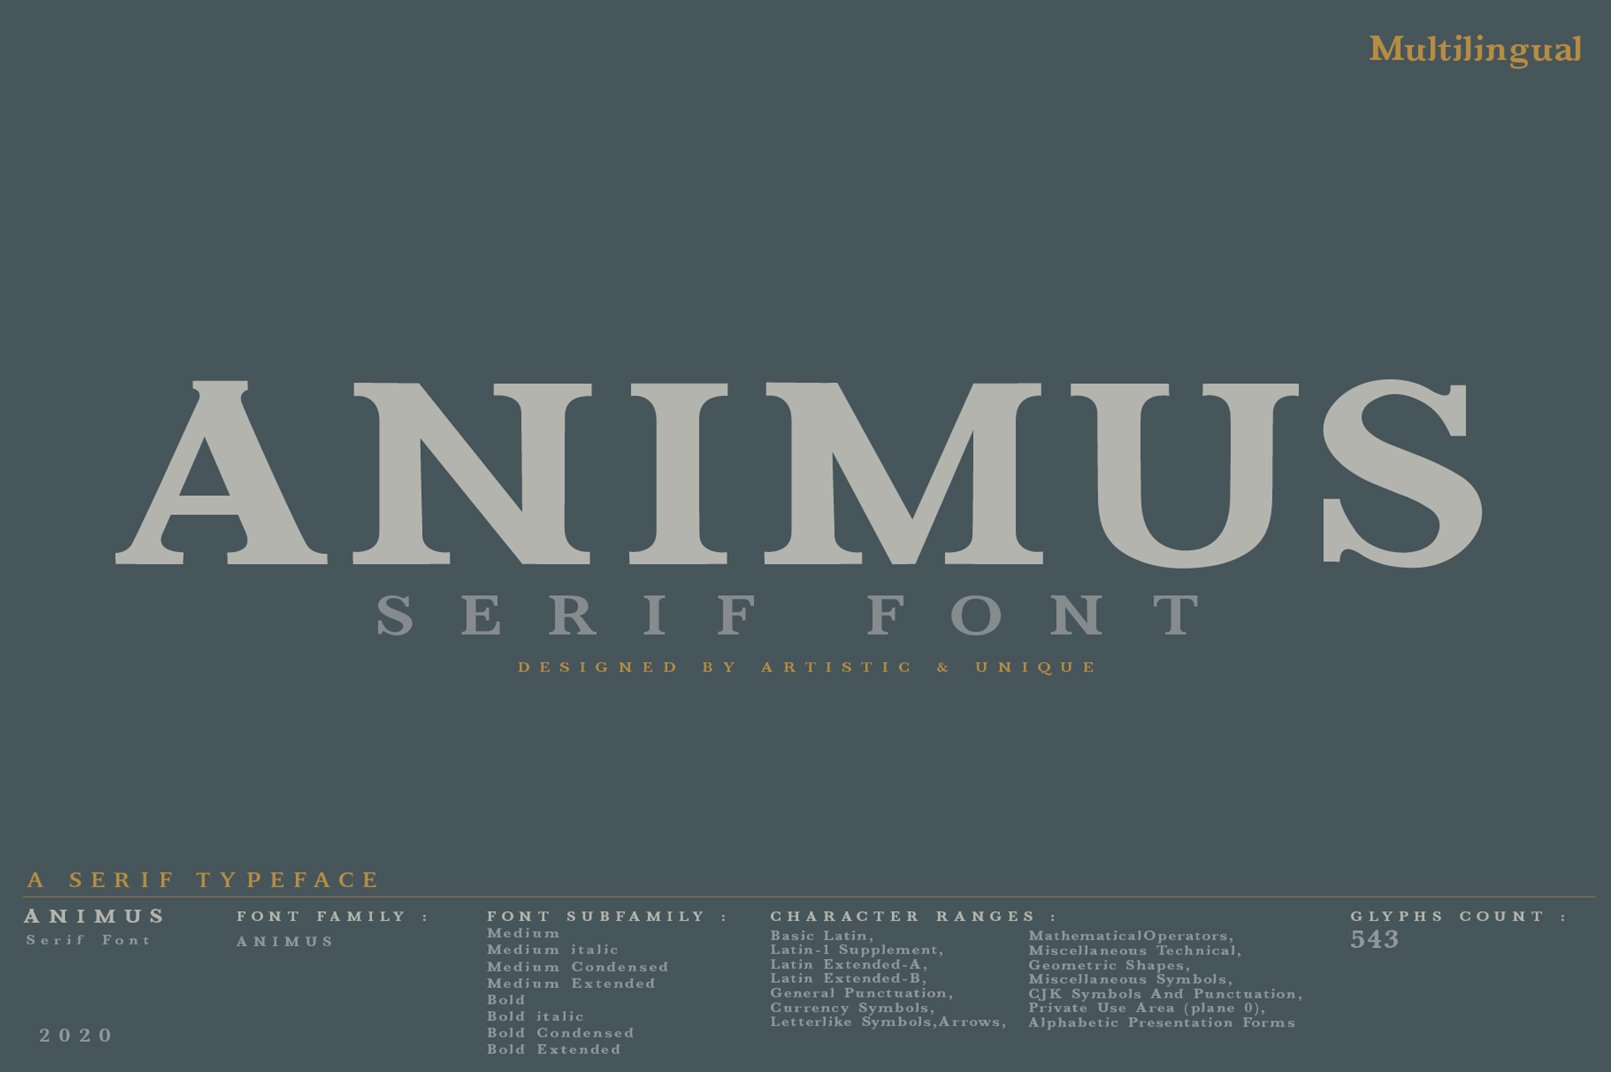 ANIMUS - Serif font family example image 9